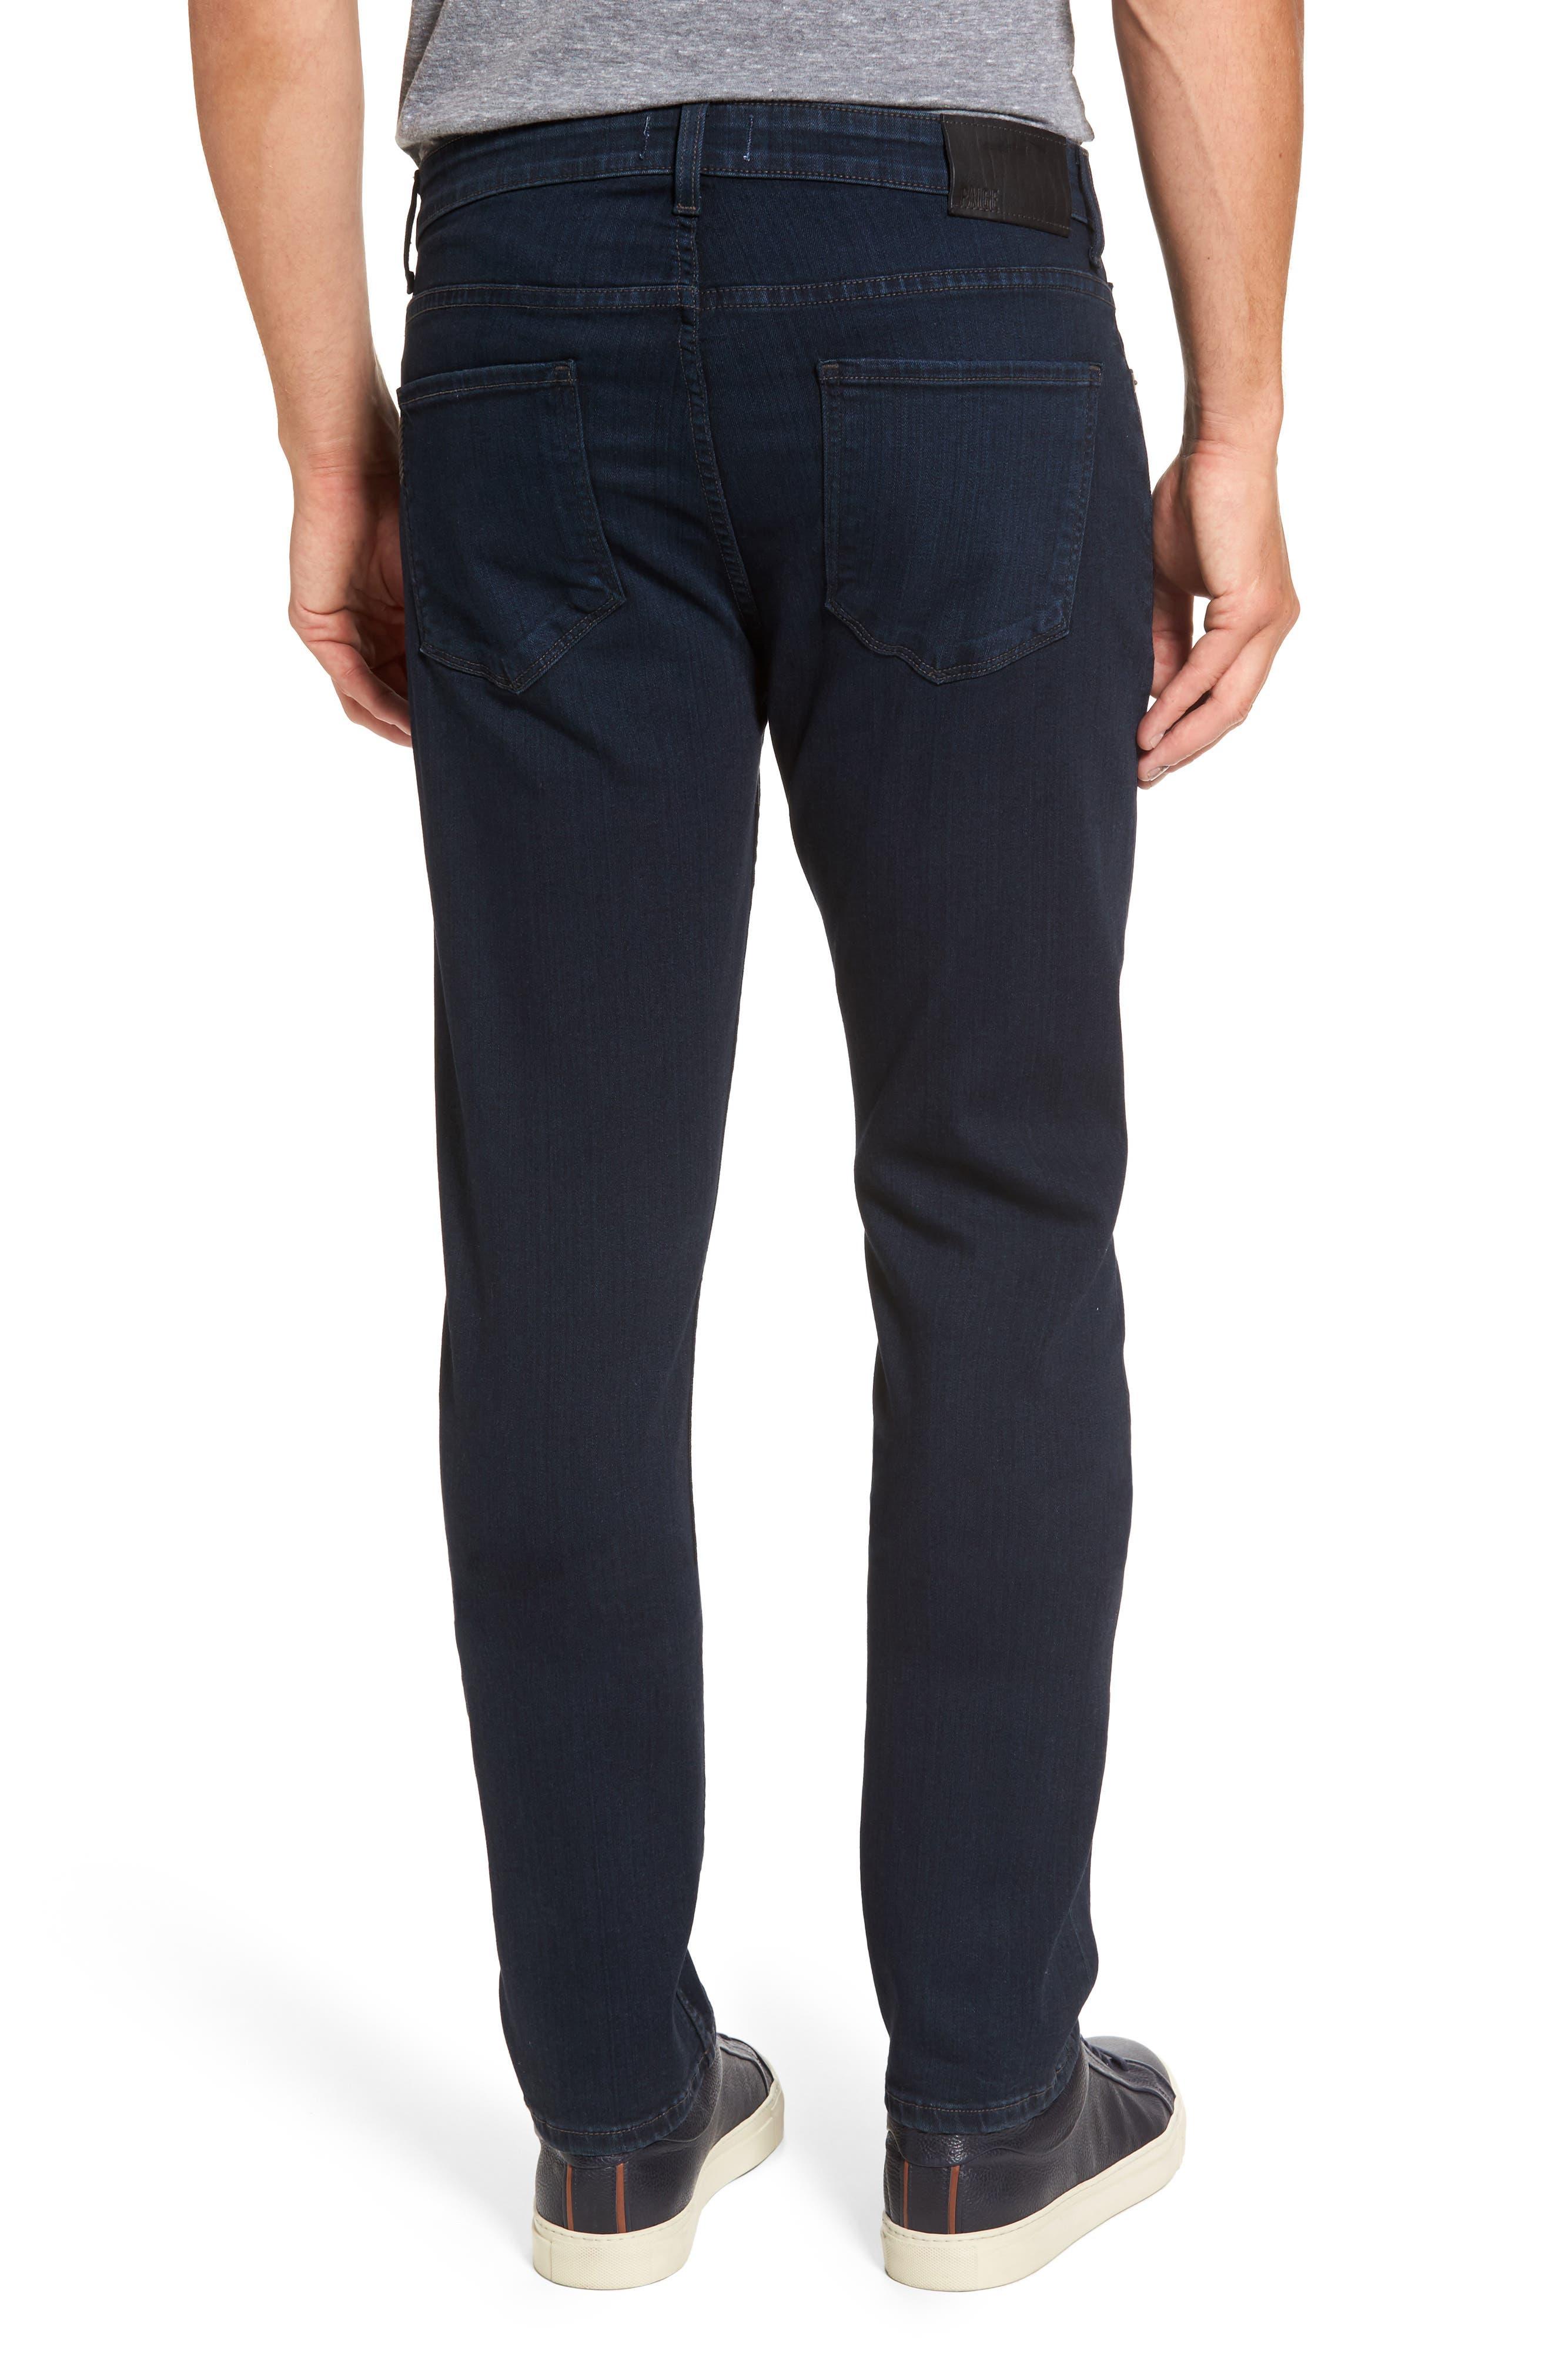 PAIGE, Normandie Straight Leg Jeans, Alternate thumbnail 2, color, ARLO